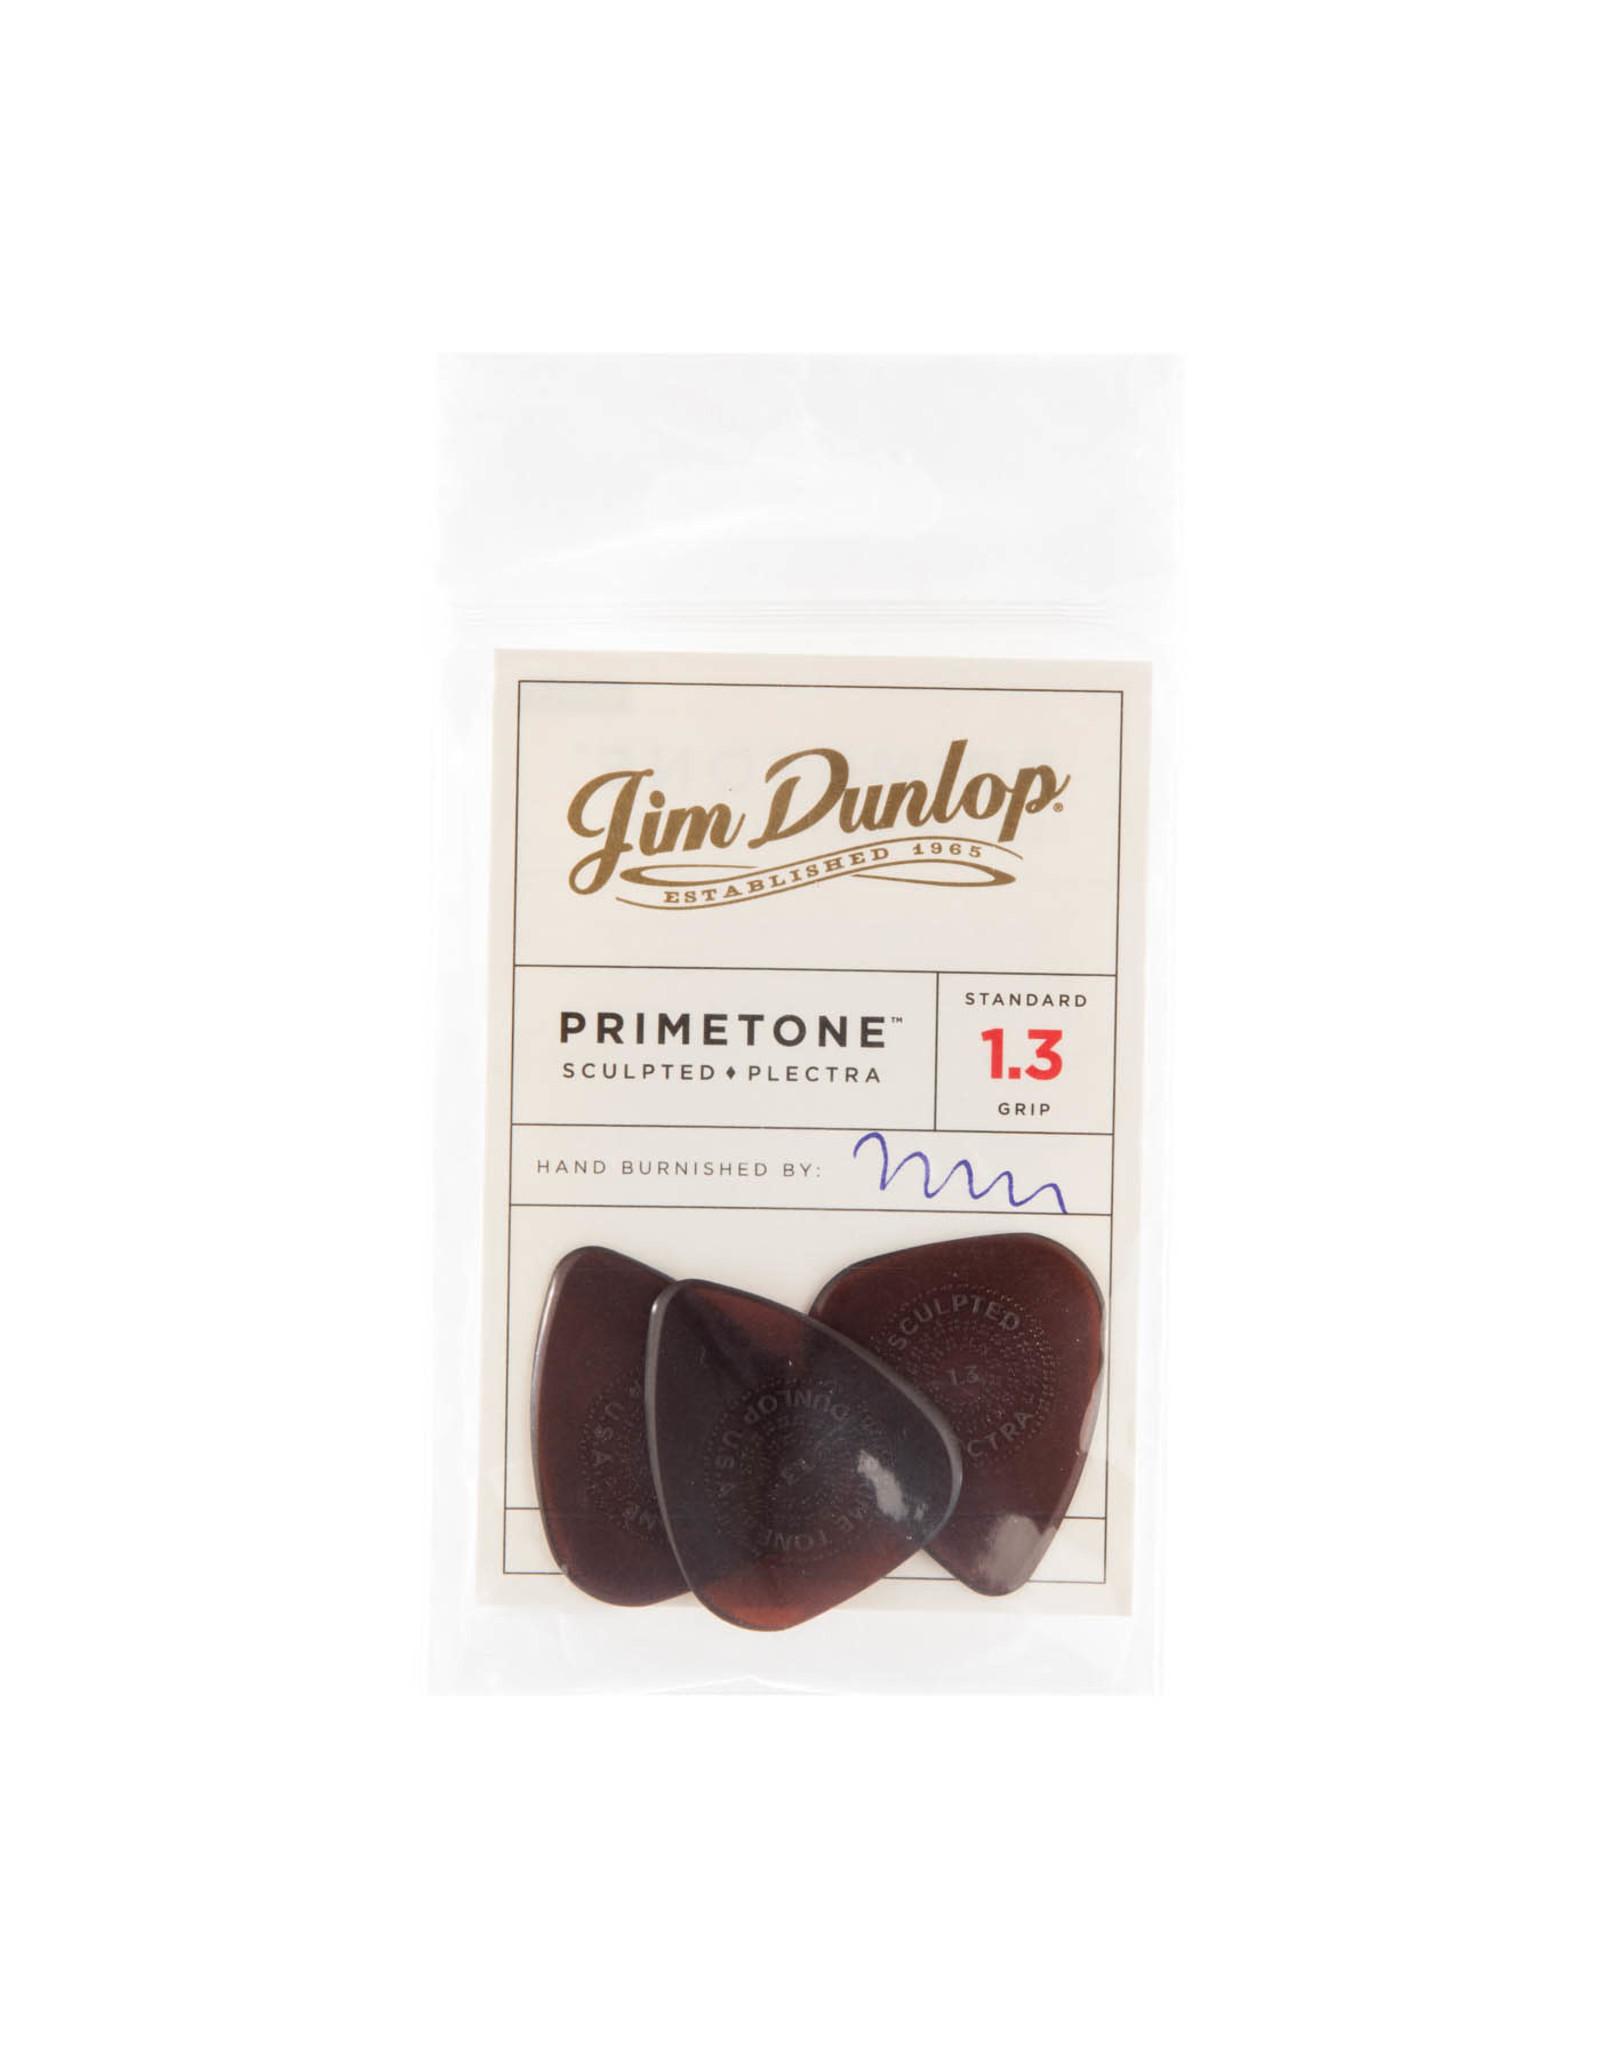 Jim Dunlop Jim Dunlop PRIMETONE® Standard 1.3 Guitar Pick 3 Pack